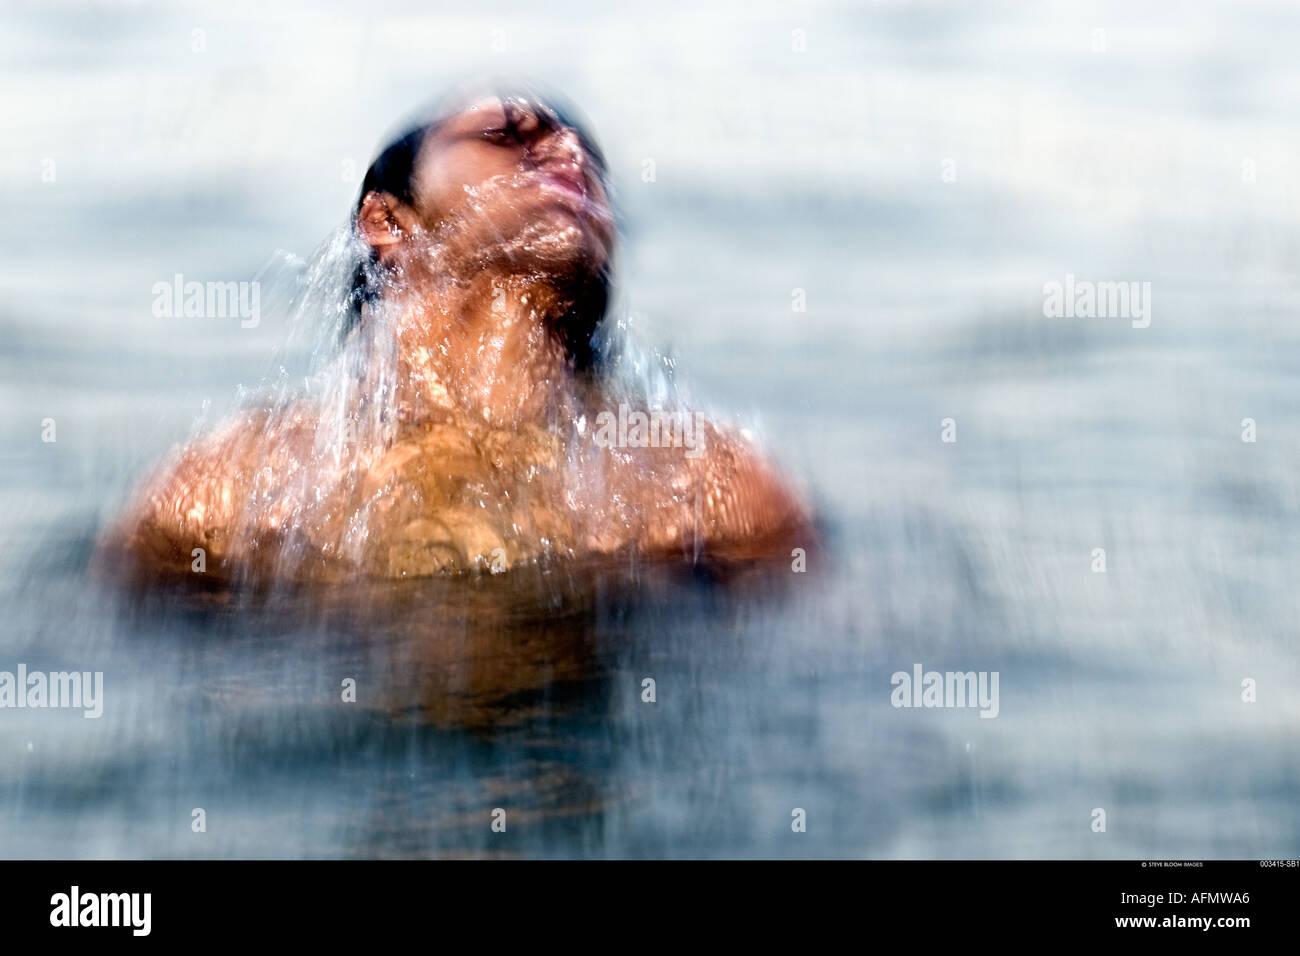 L'homme se baignant dans le Gange Varanasi Inde Photo Stock